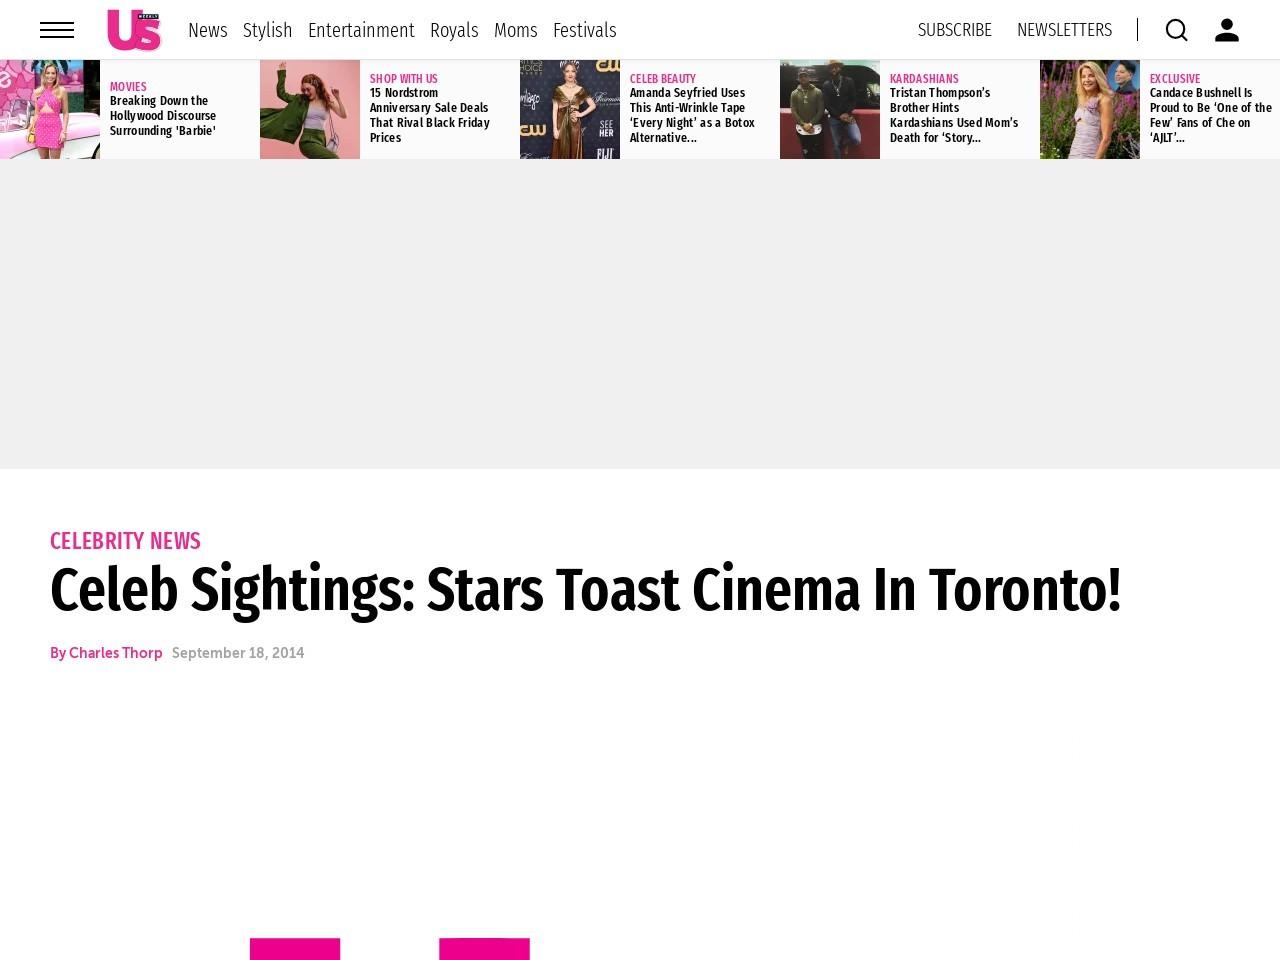 Celeb Sightings: Stars Toast Cinema In Toronto!